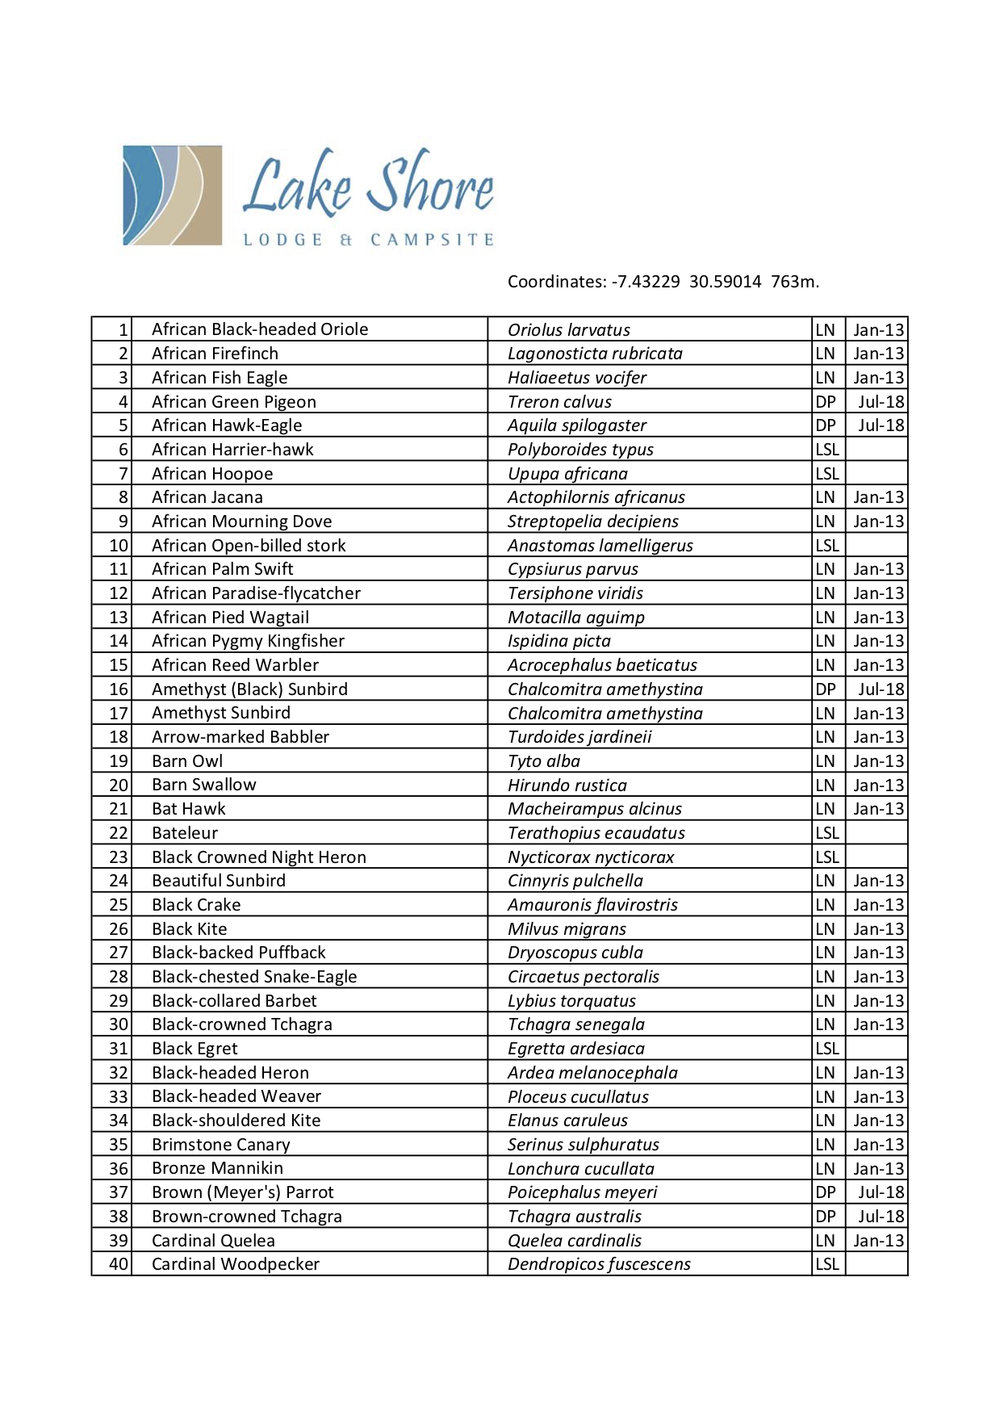 Lake Shore Bird List July 2018 Sheet 1 of 4.jpg